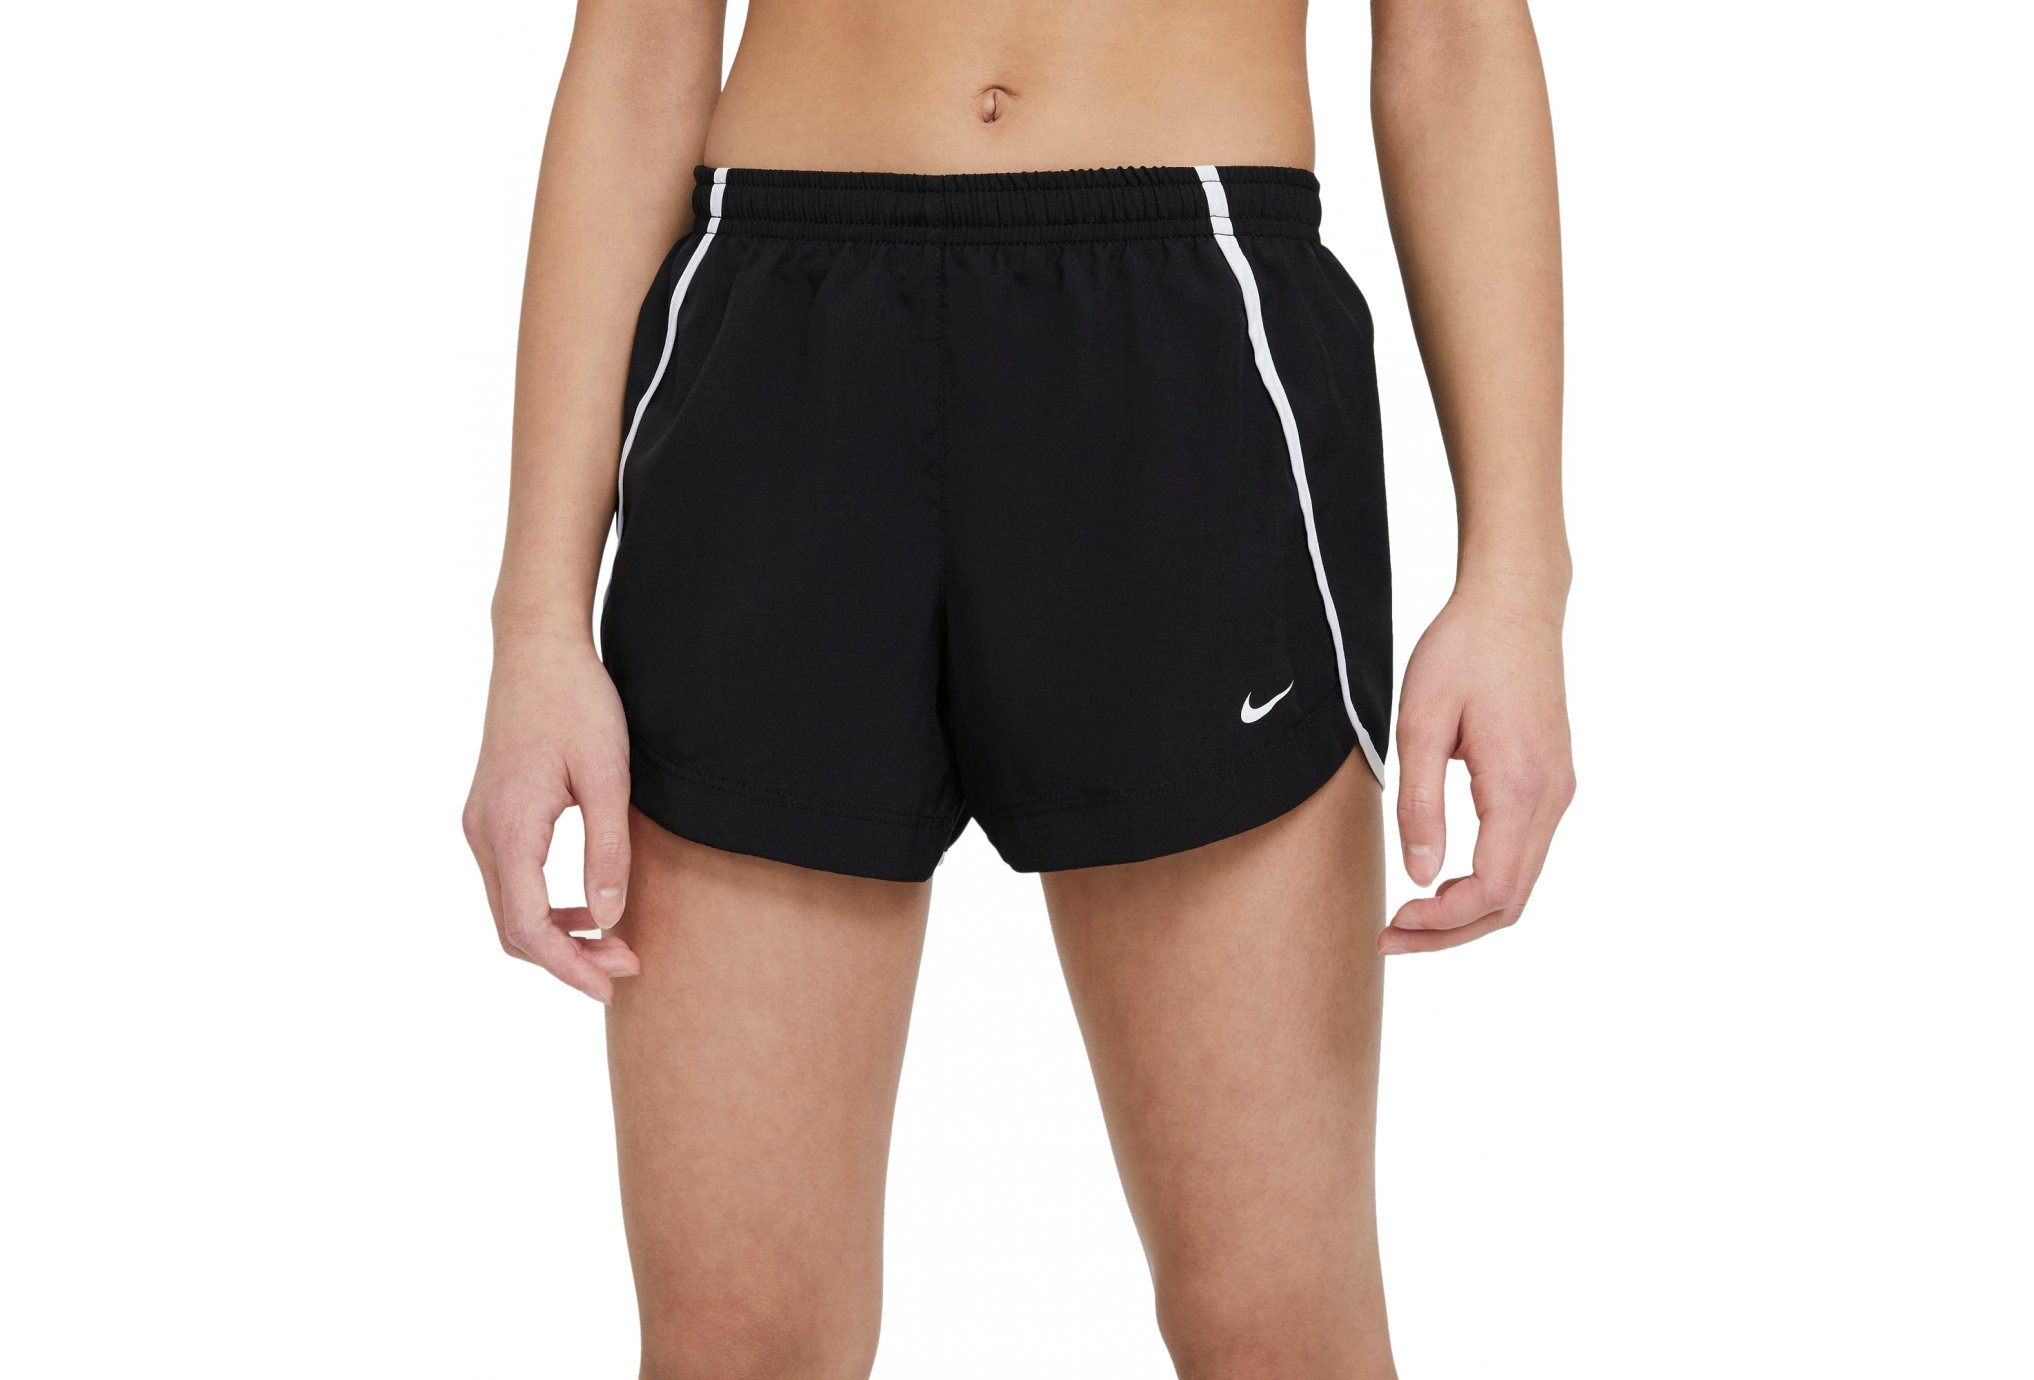 Nike Dri-Fit Sprinter Fille vêtement running femme